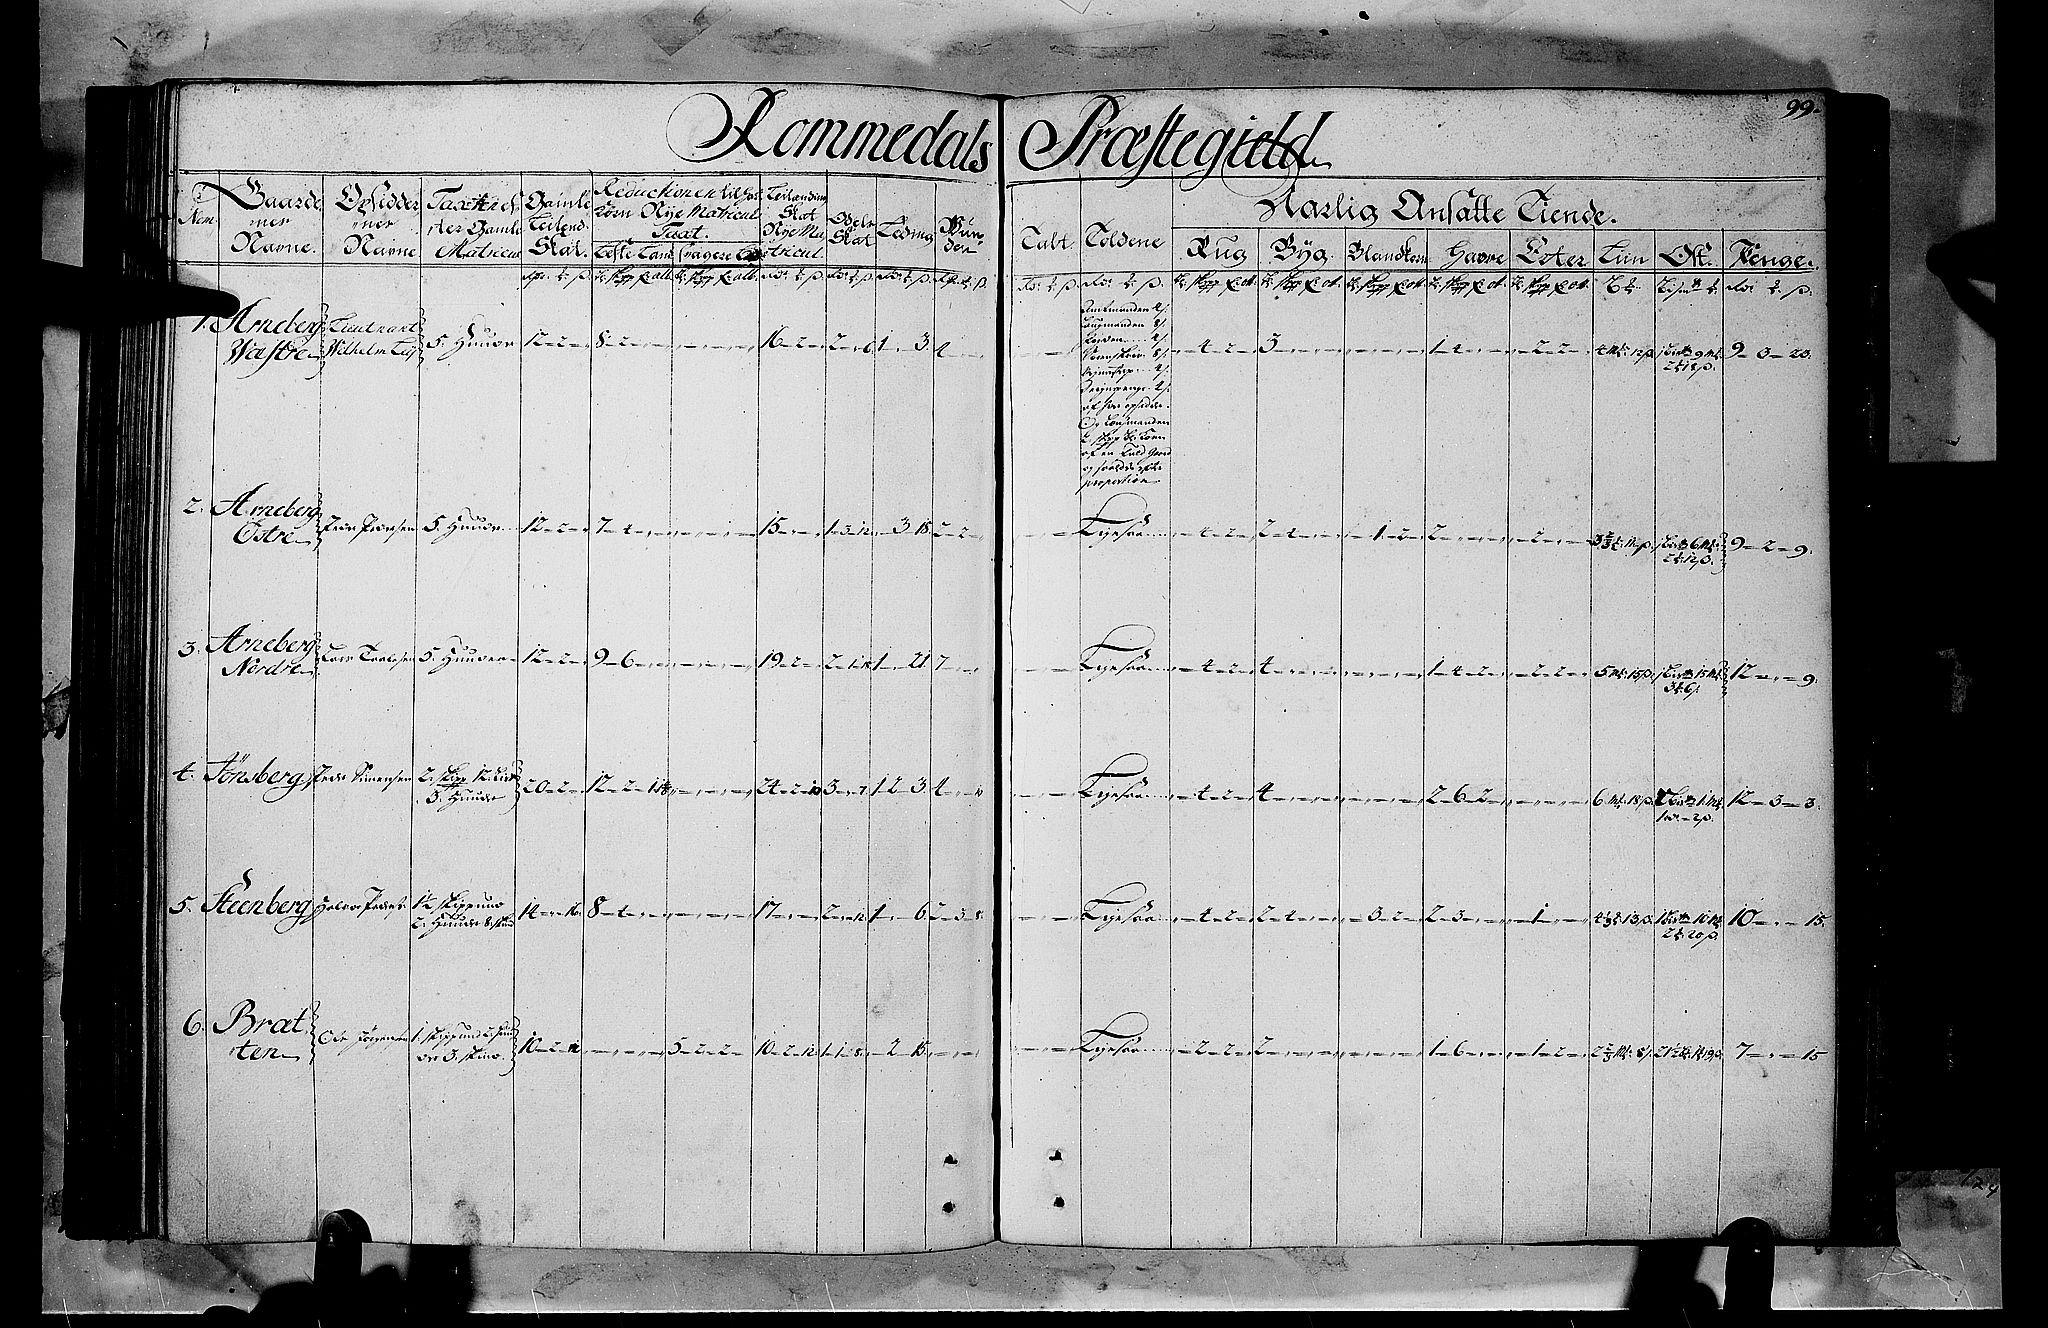 RA, Rentekammeret inntil 1814, Realistisk ordnet avdeling, Fb/L0008b: Ullerål allmenning, 1723, s. 98b-99a